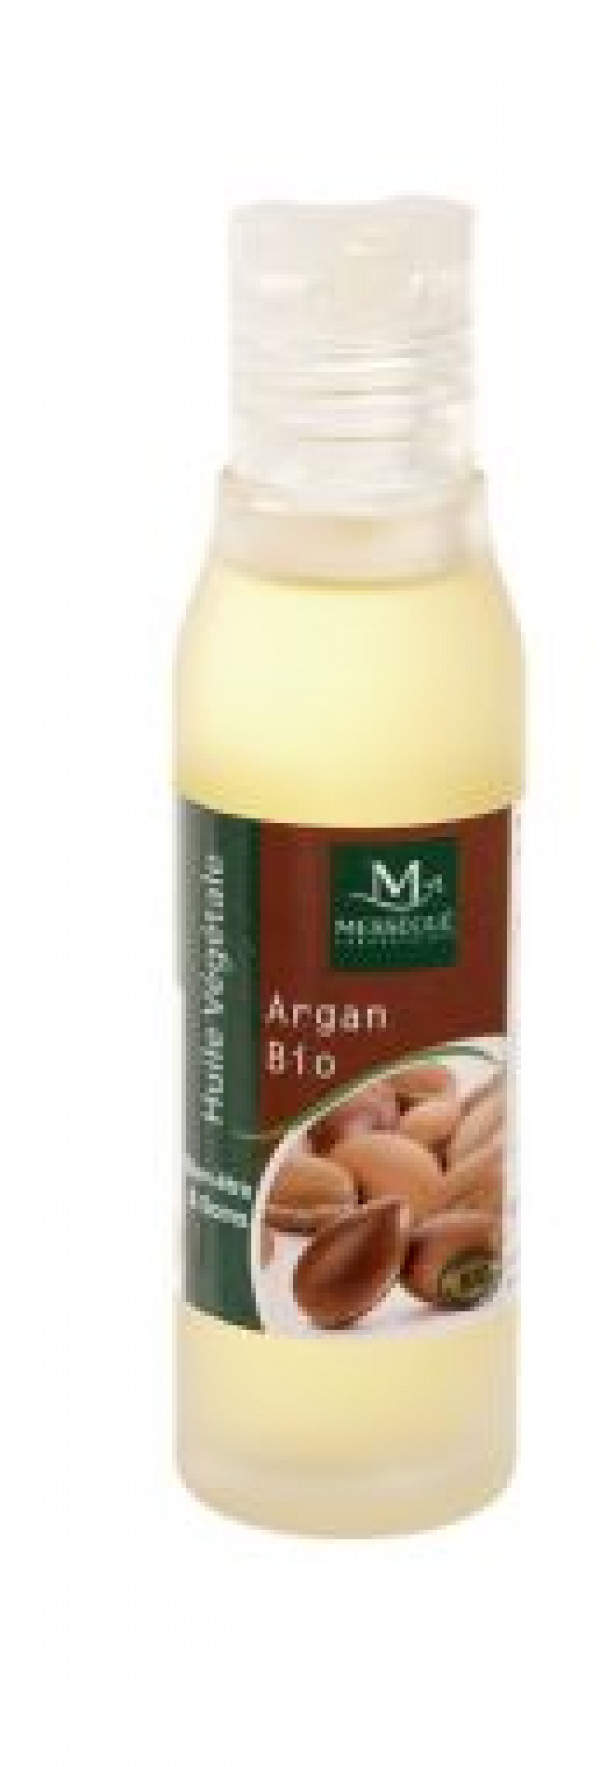 Mességué Argan Bio luomuargaaniöljy 50 ml